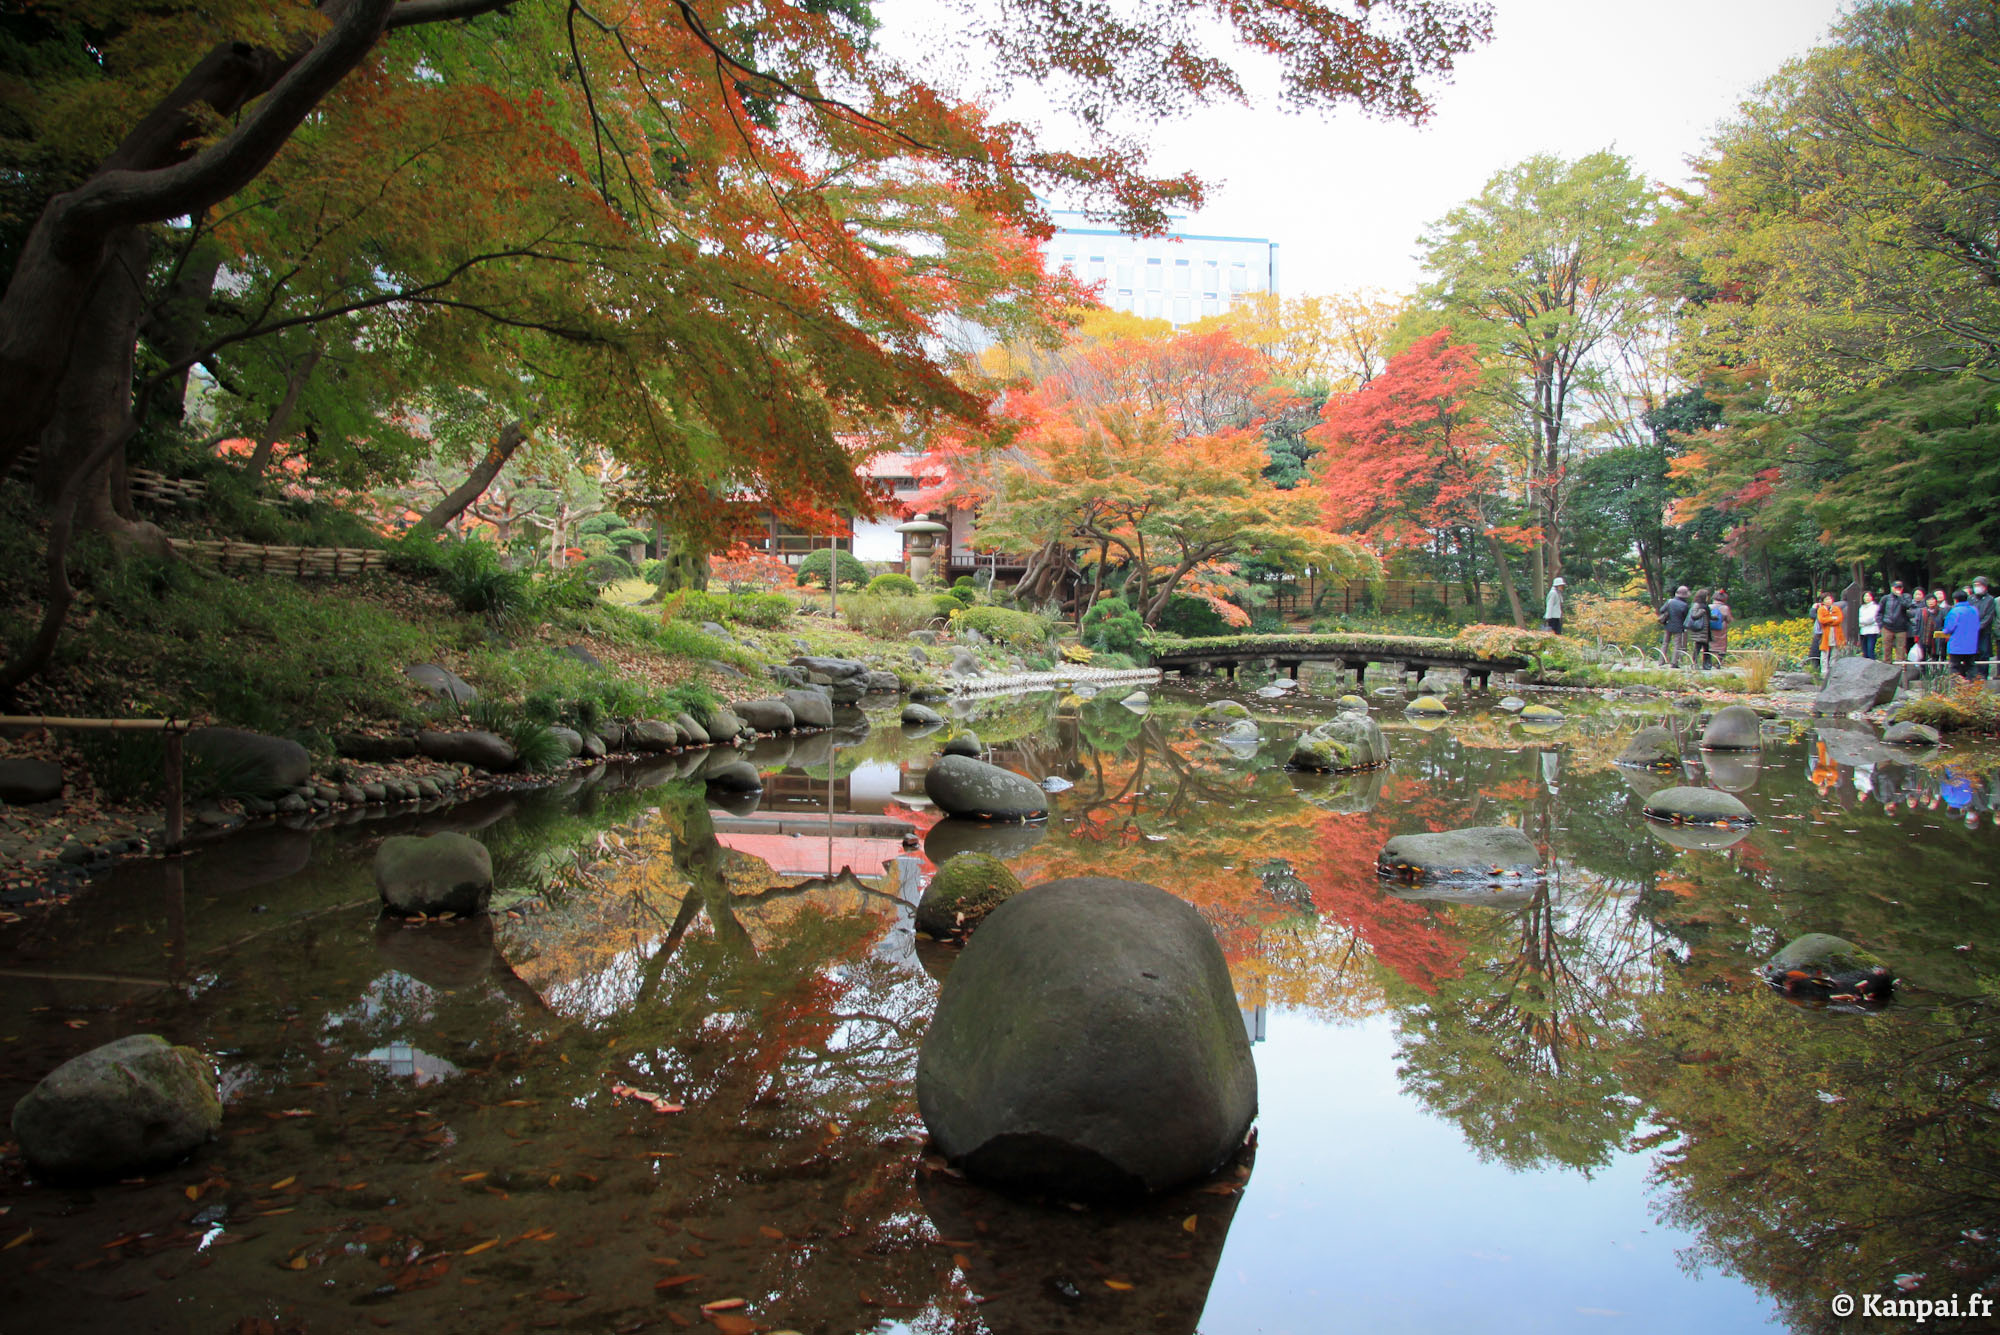 koishikawa korakuen le jardin japonais de tokyo dome